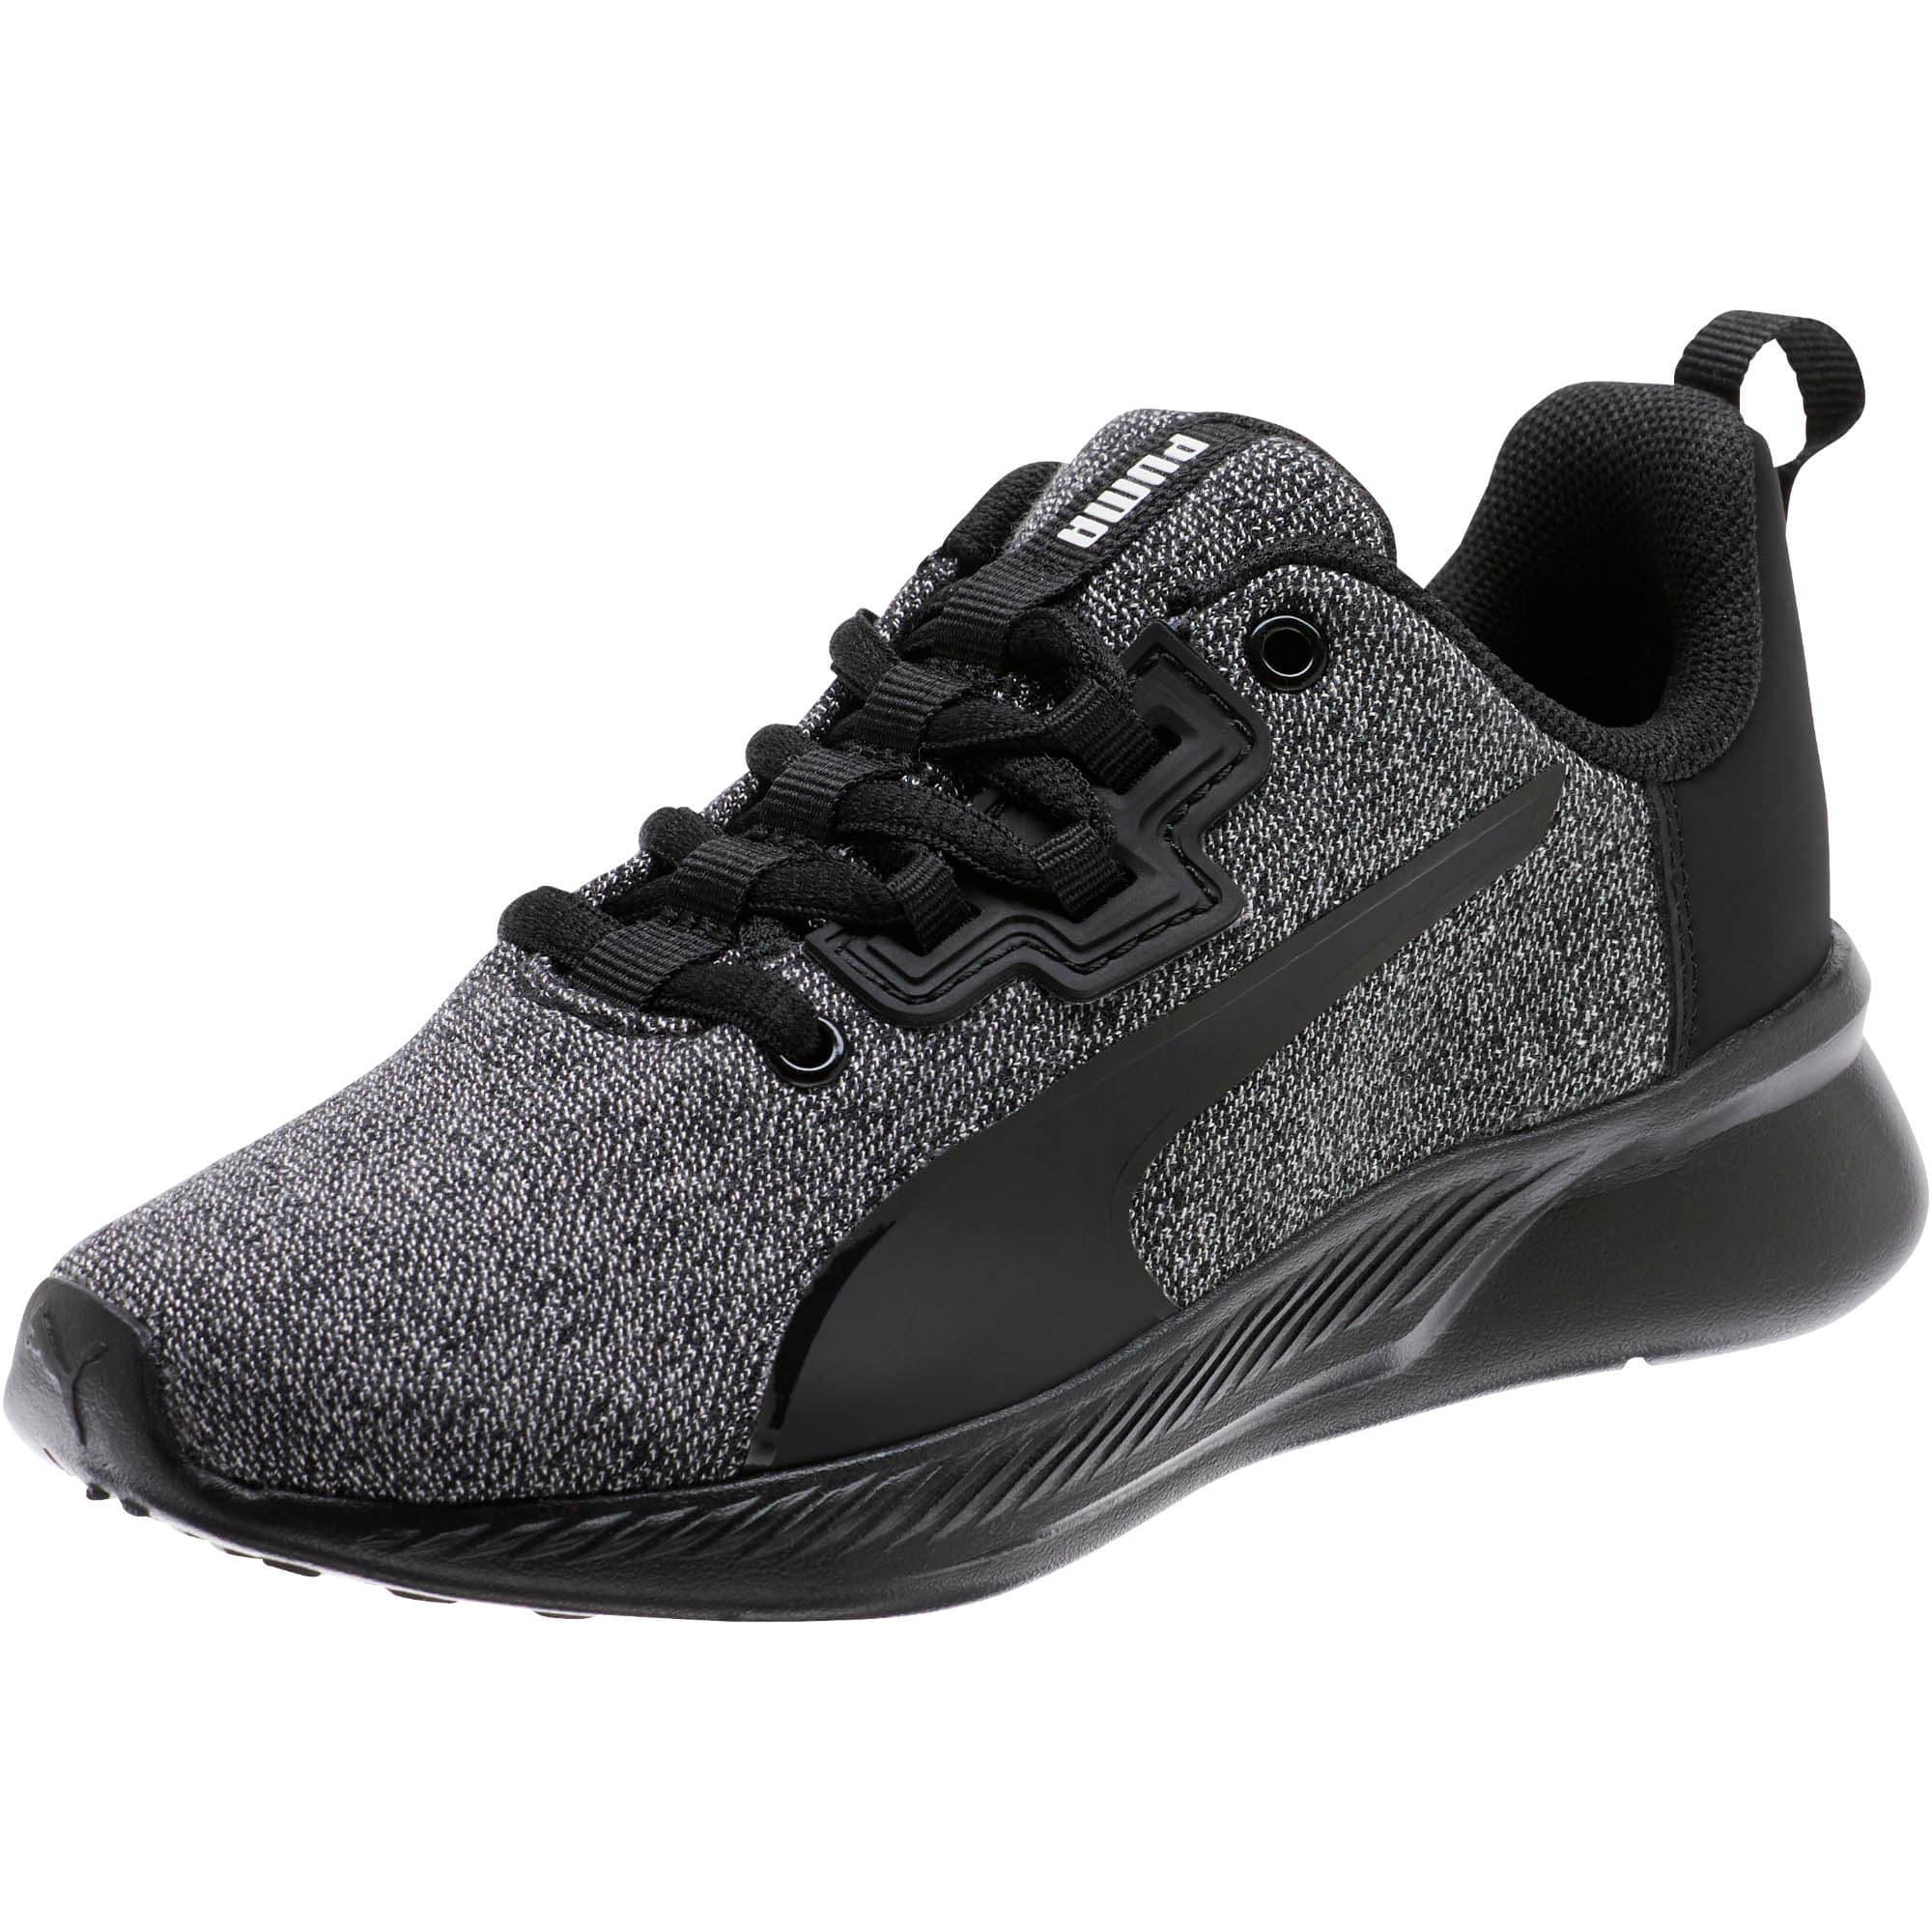 Thumbnail 1 of Tishatsu Runner Knit Little Kids' Shoes, Puma Black-Puma White, medium